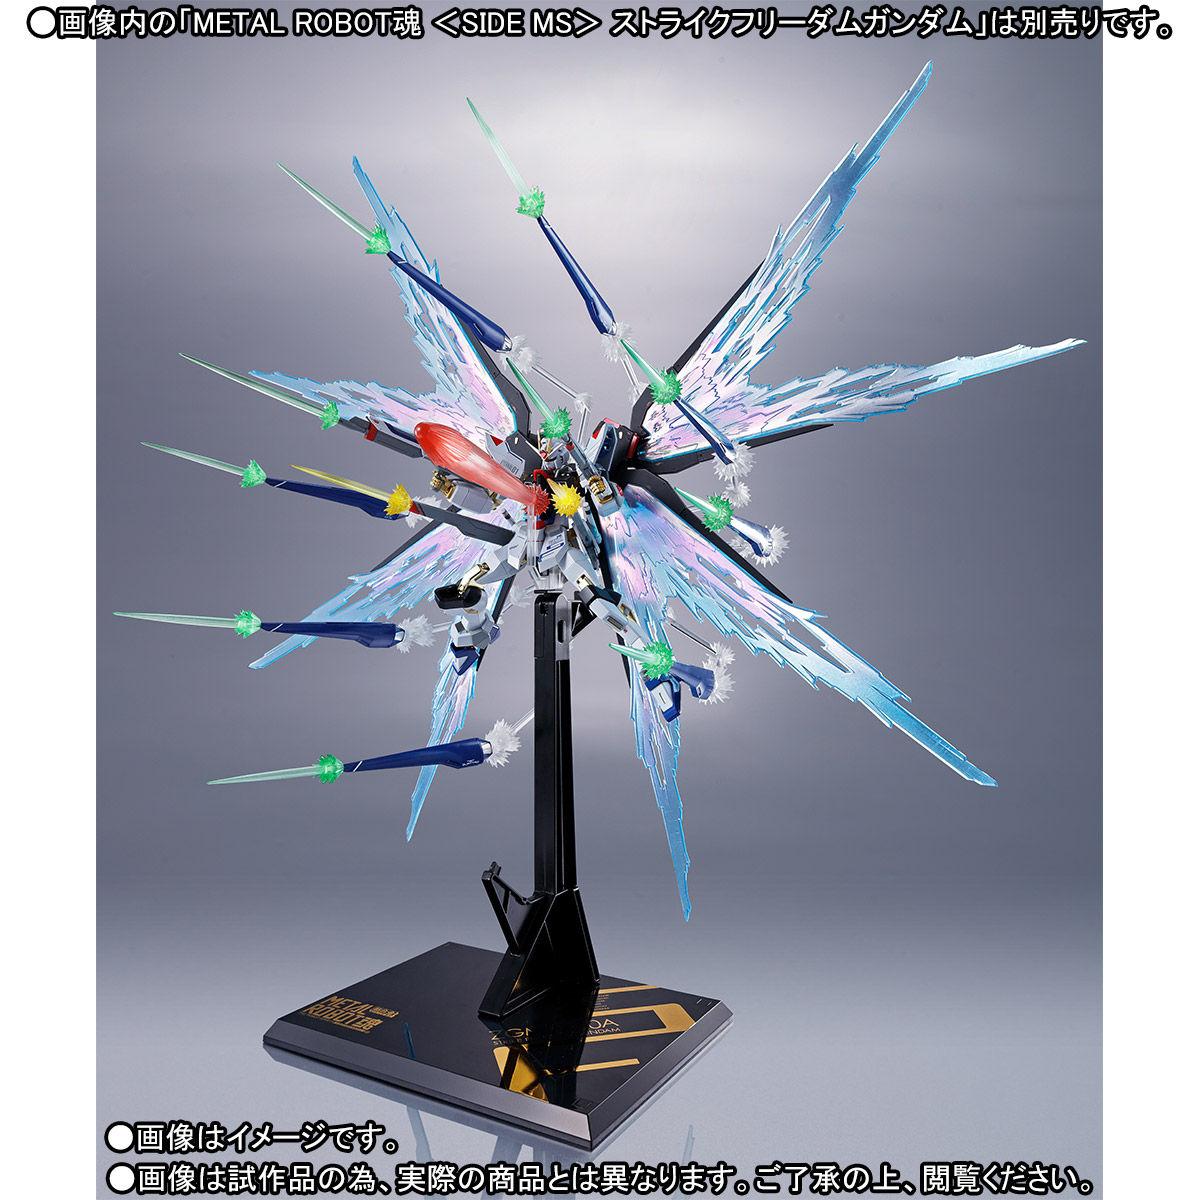 GUNDAM LOG「METAL ROBOT魂ストライクフリーダム」 光の翼とフルバーストのエフェクトが本体過ぎる…